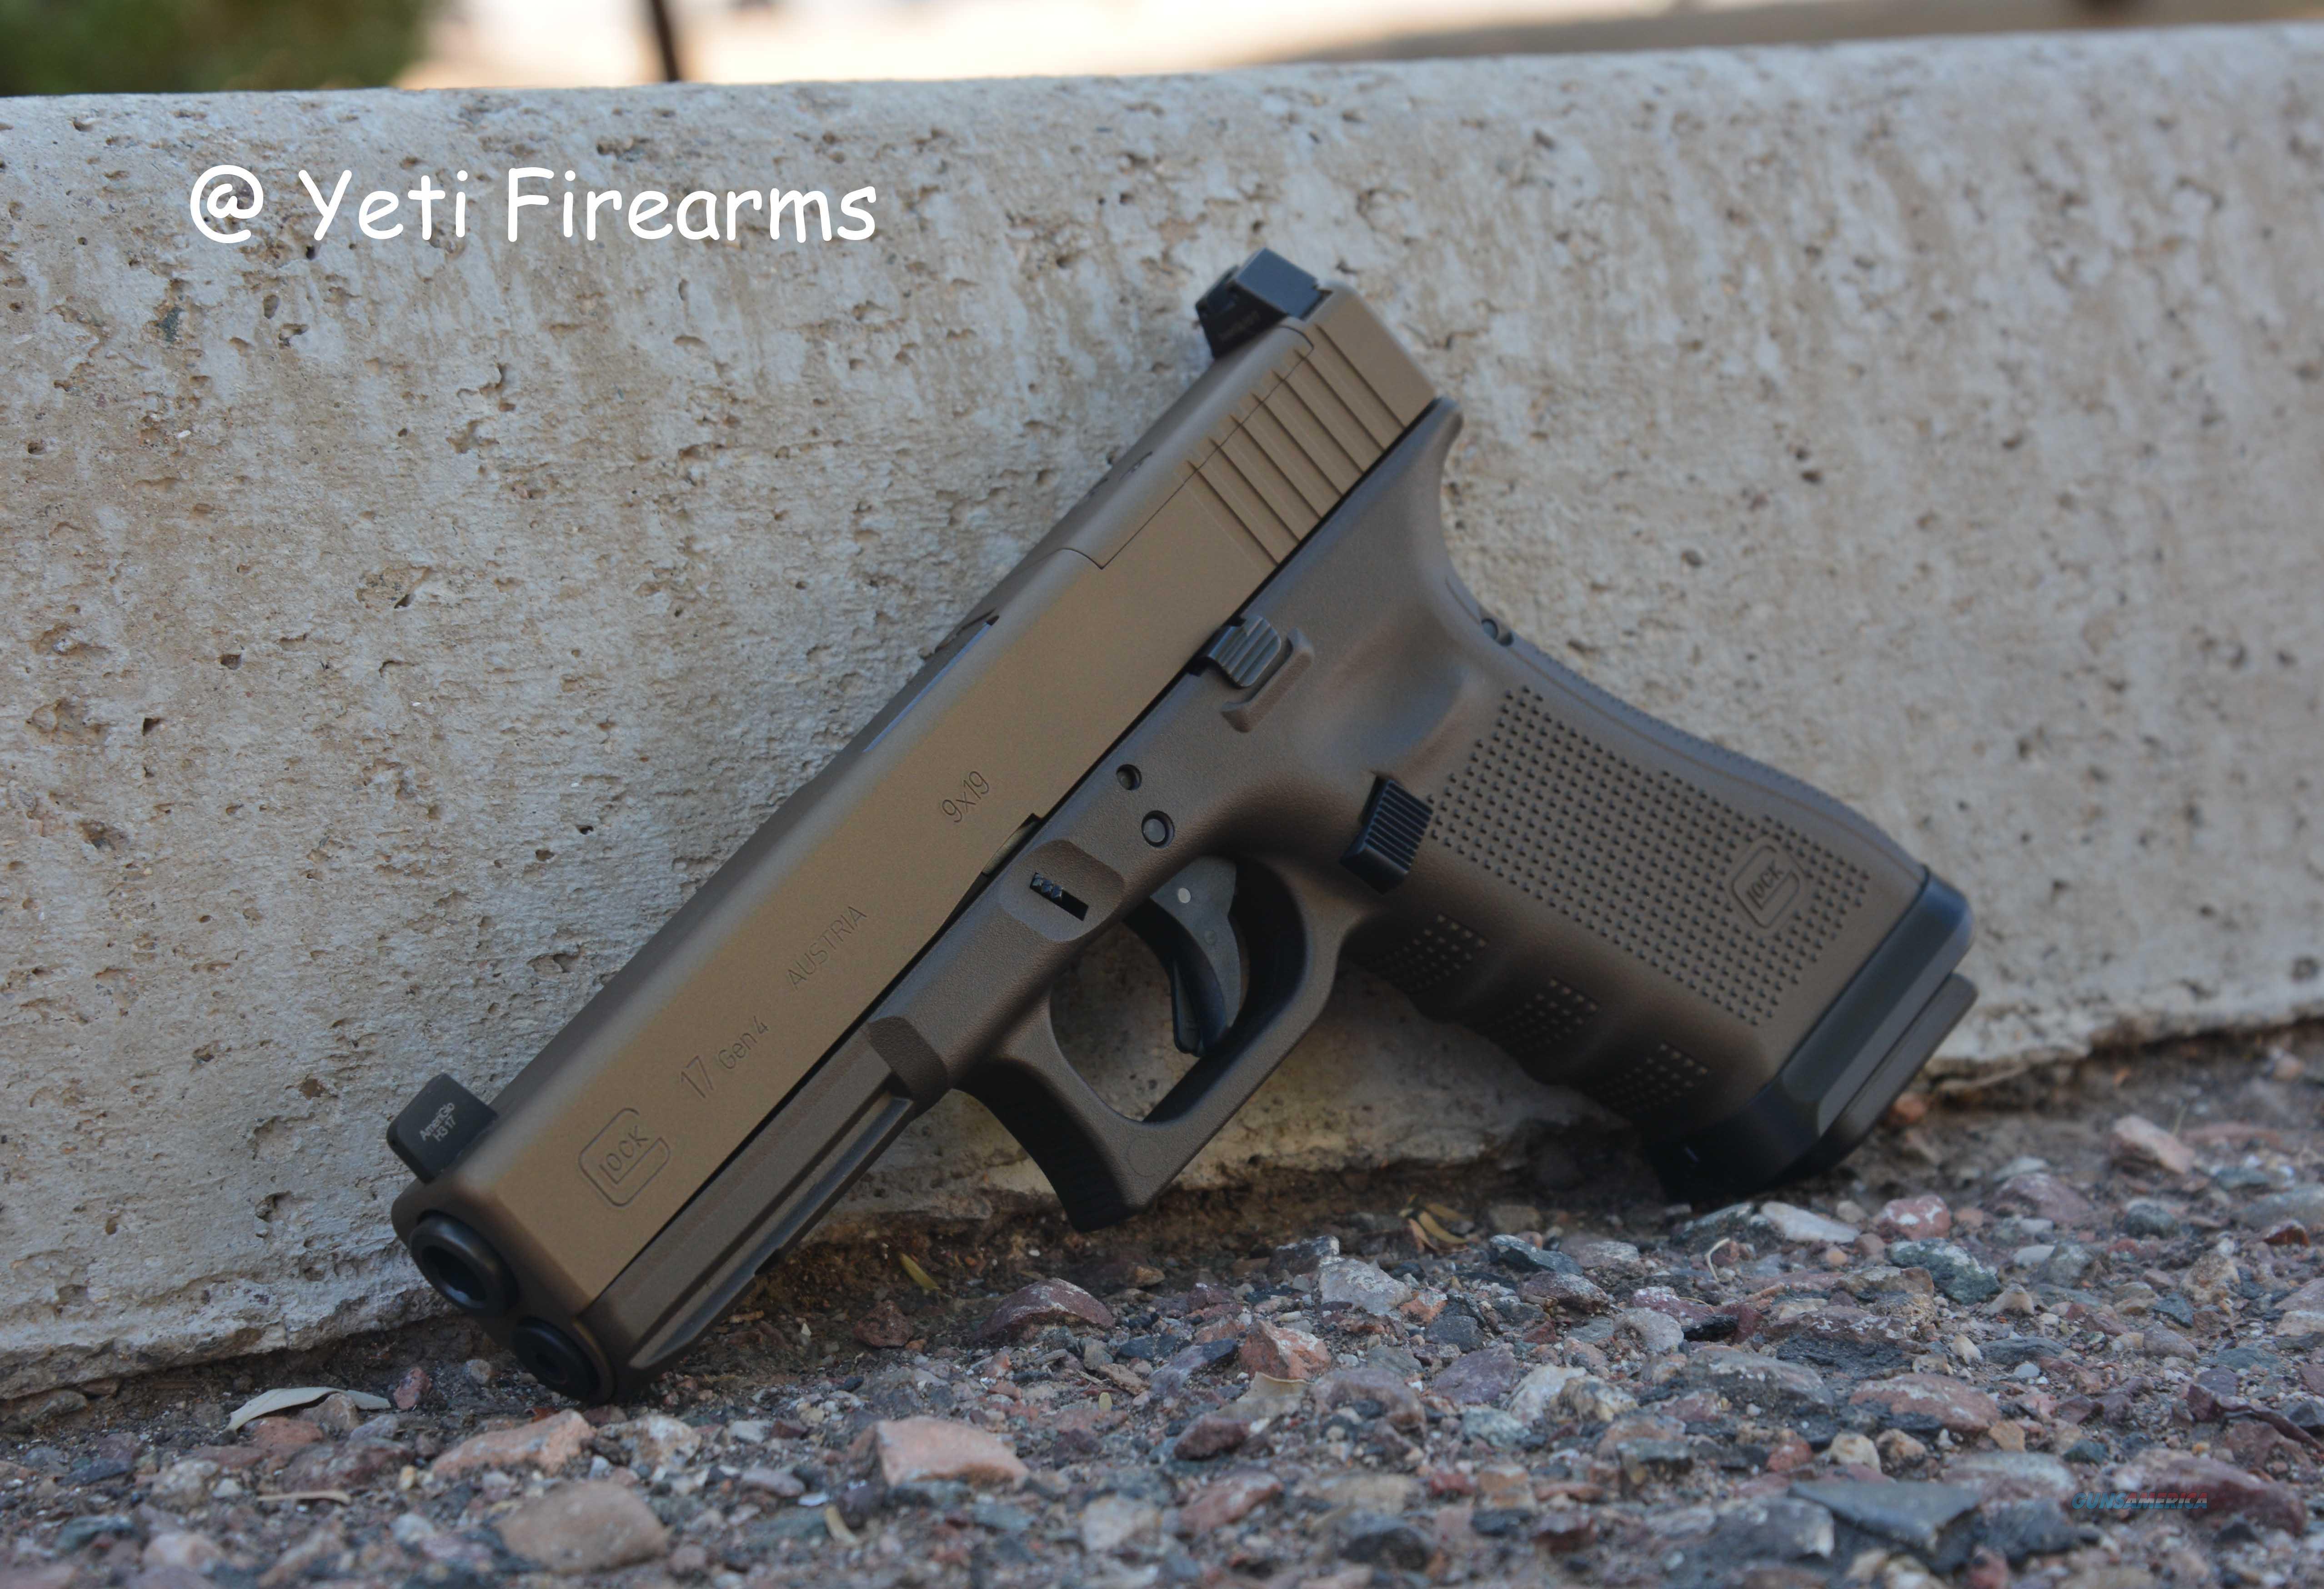 Glock 17 G4 MOS 9mm Burnt / Midnight Bronze + NS  Guns > Pistols > Glock Pistols > 17